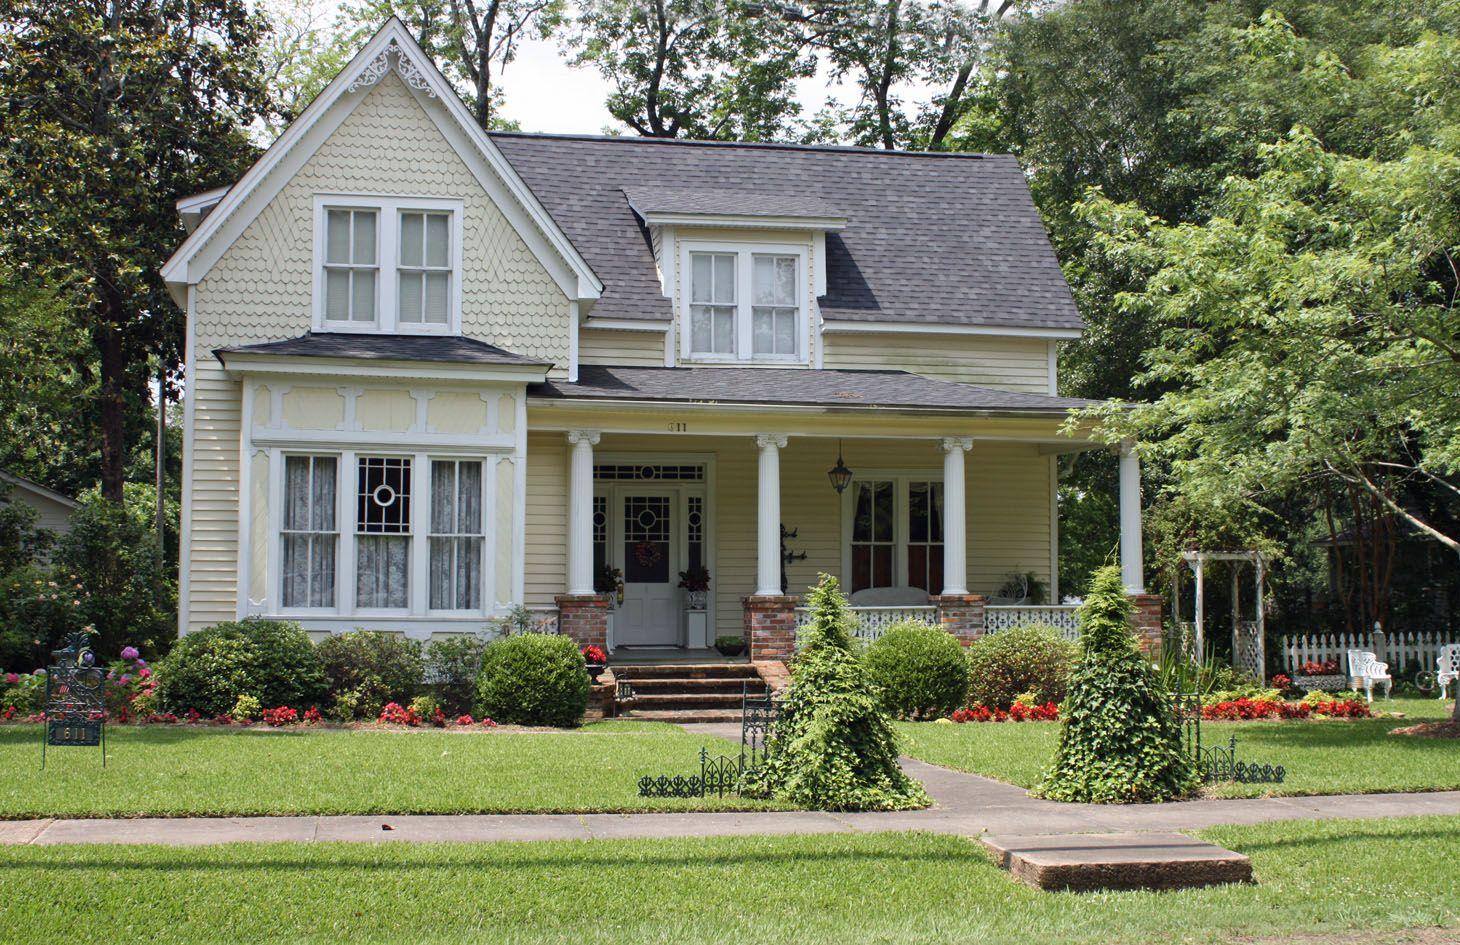 Cream farmhouse - pretty exterior color | Home Ideas | Pinterest ...